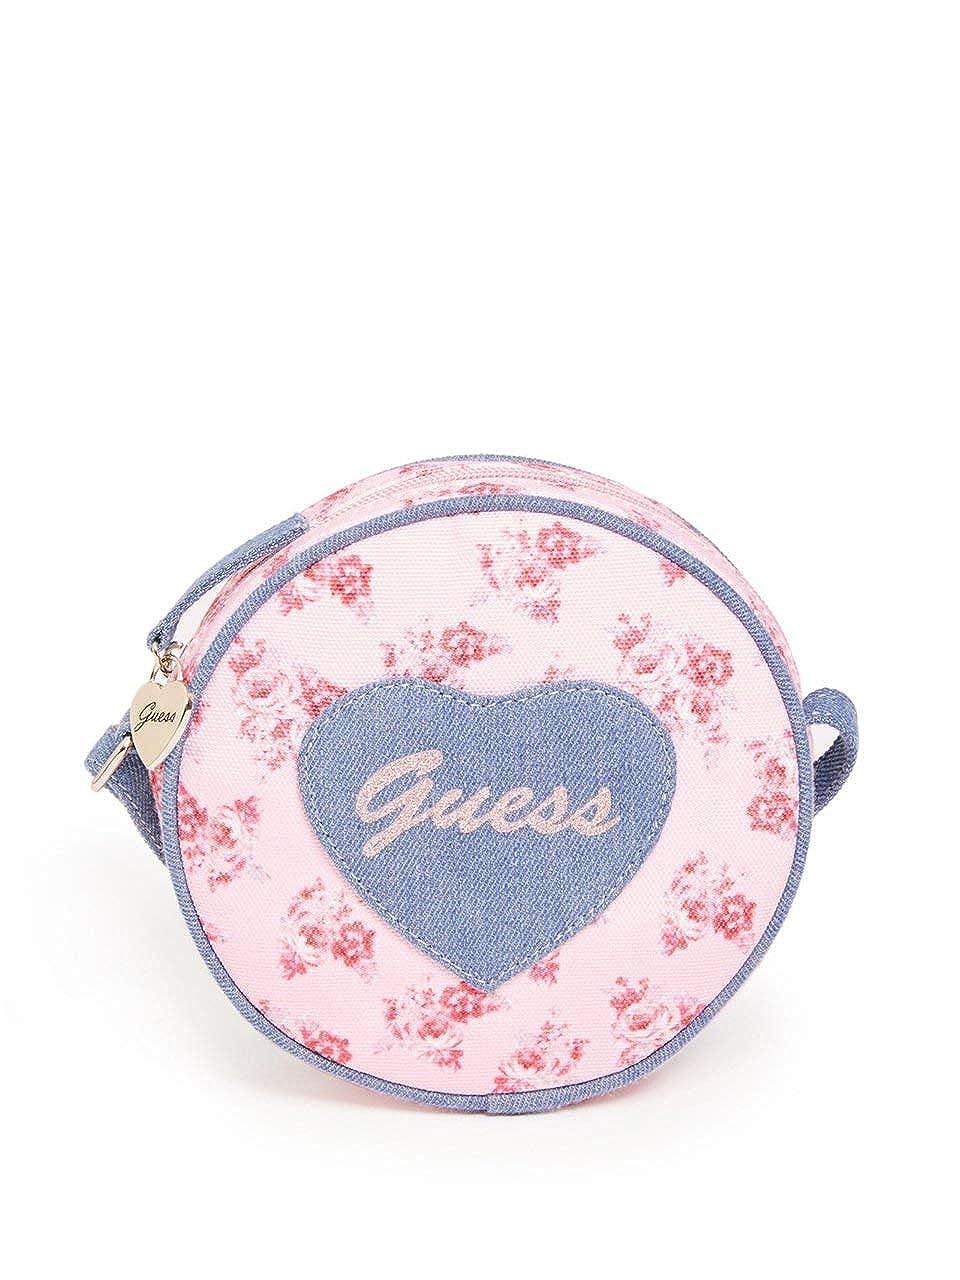 GUESS Factory Kids Girls Floral Crossbody